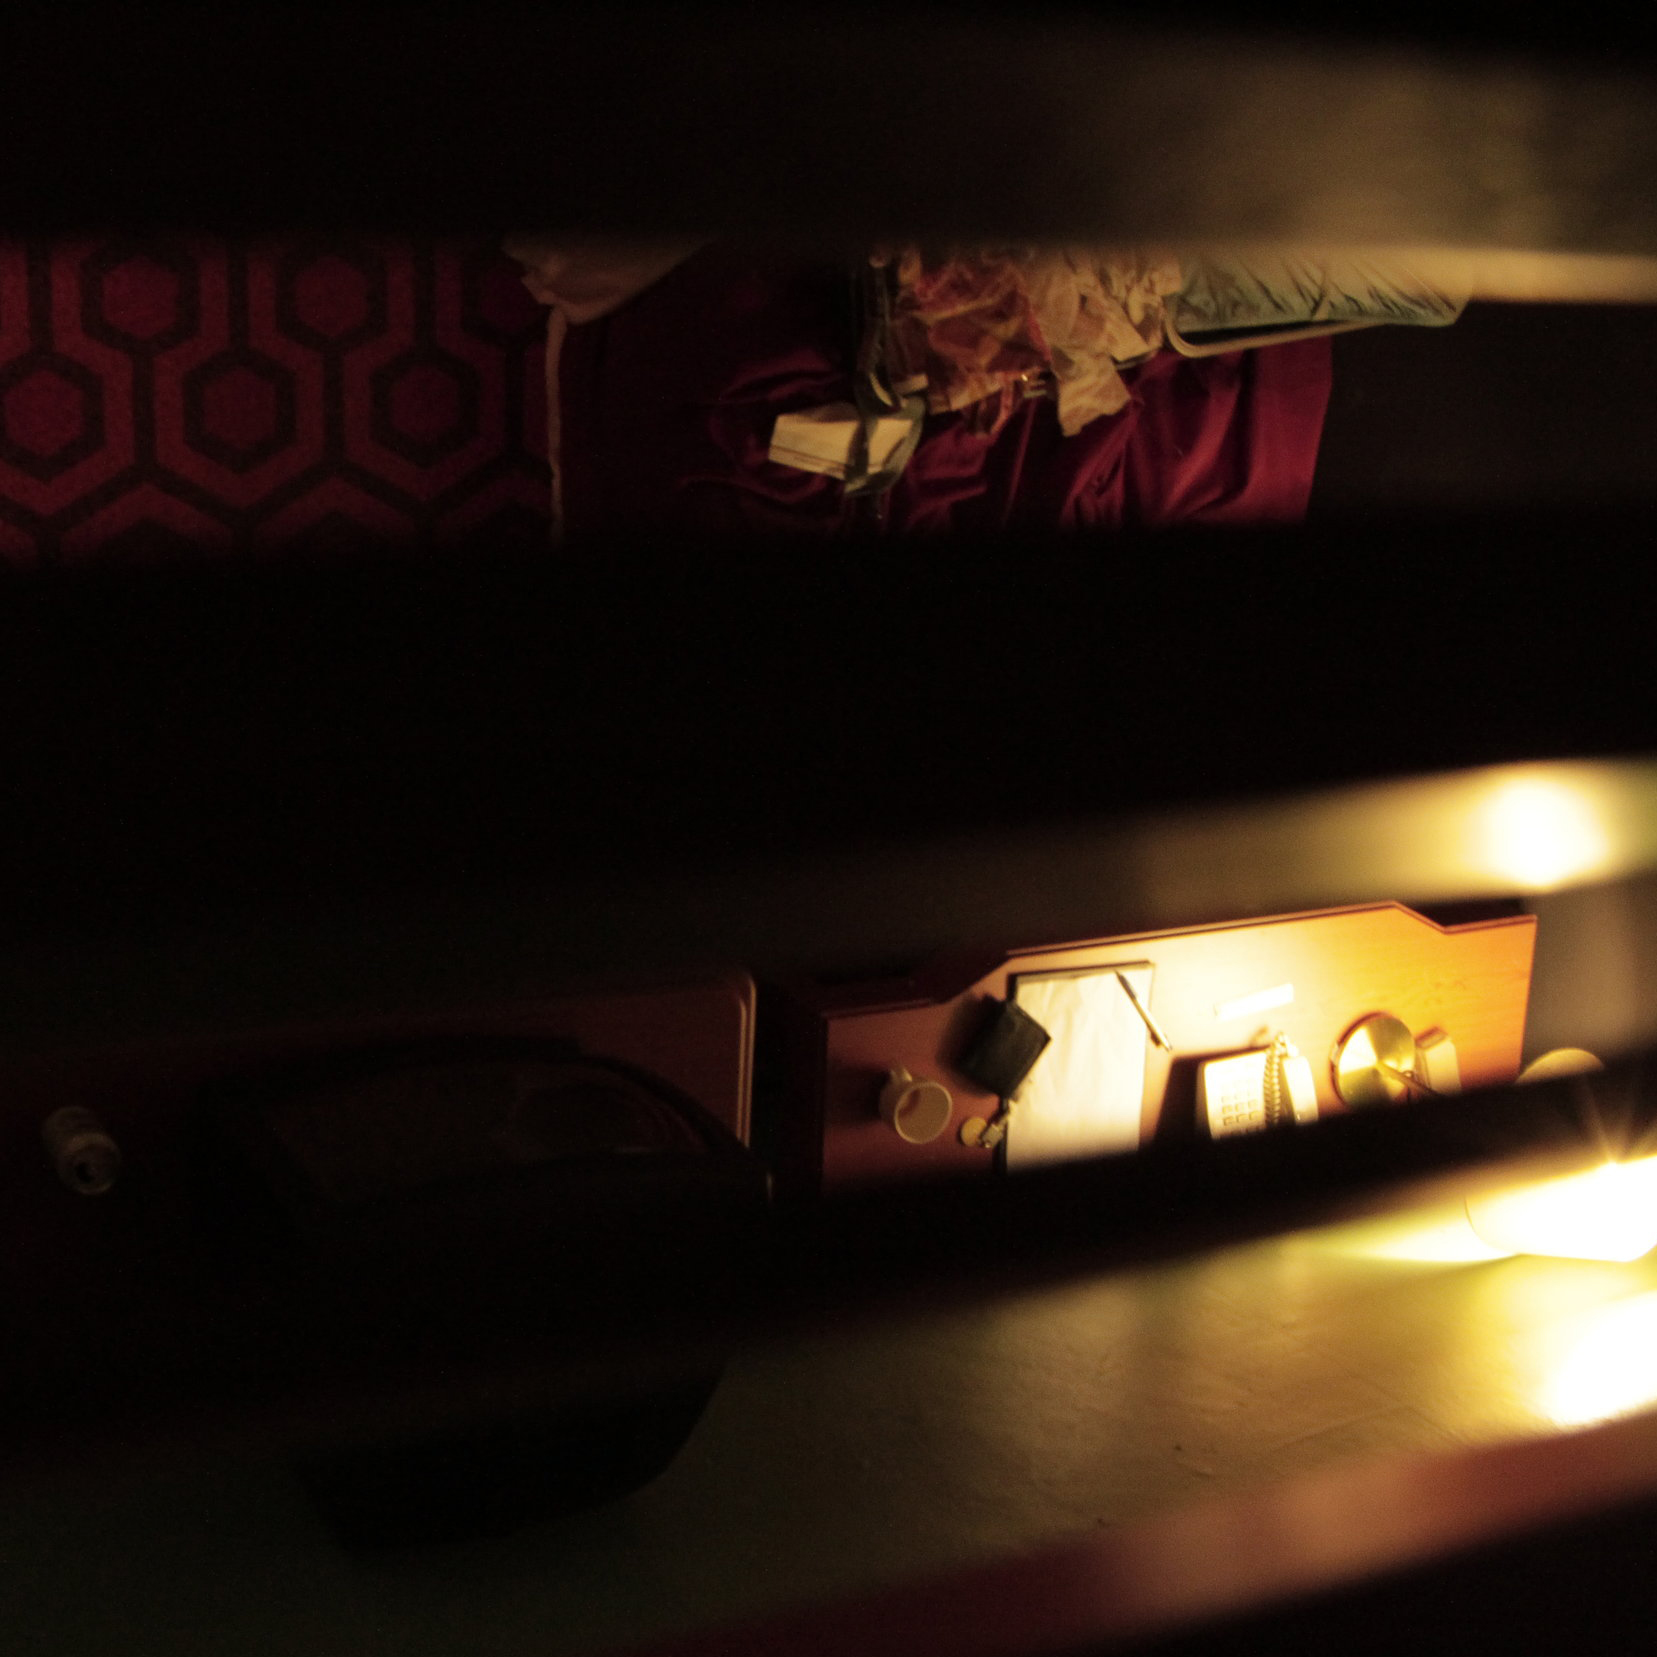 「約翰・馬汀:屠夫與外科醫生」  John Martin: the Butcher and the Surgeon  垂直潛水艇個展 Vertical Submarine    2015.12.19—2016.01.16